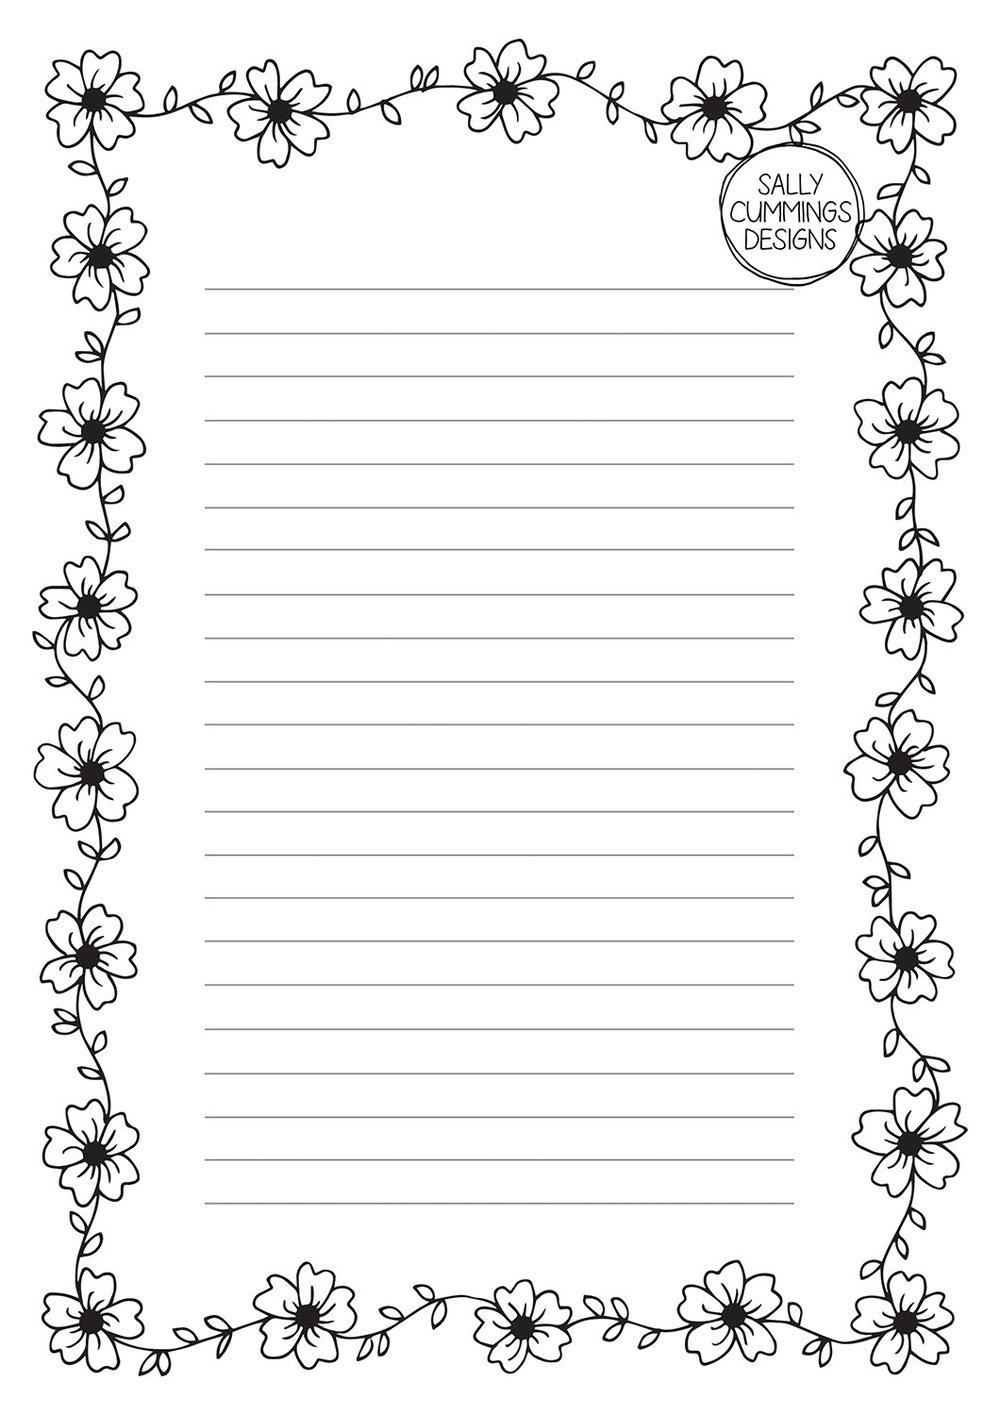 Cherry blossom writing paper - black and white